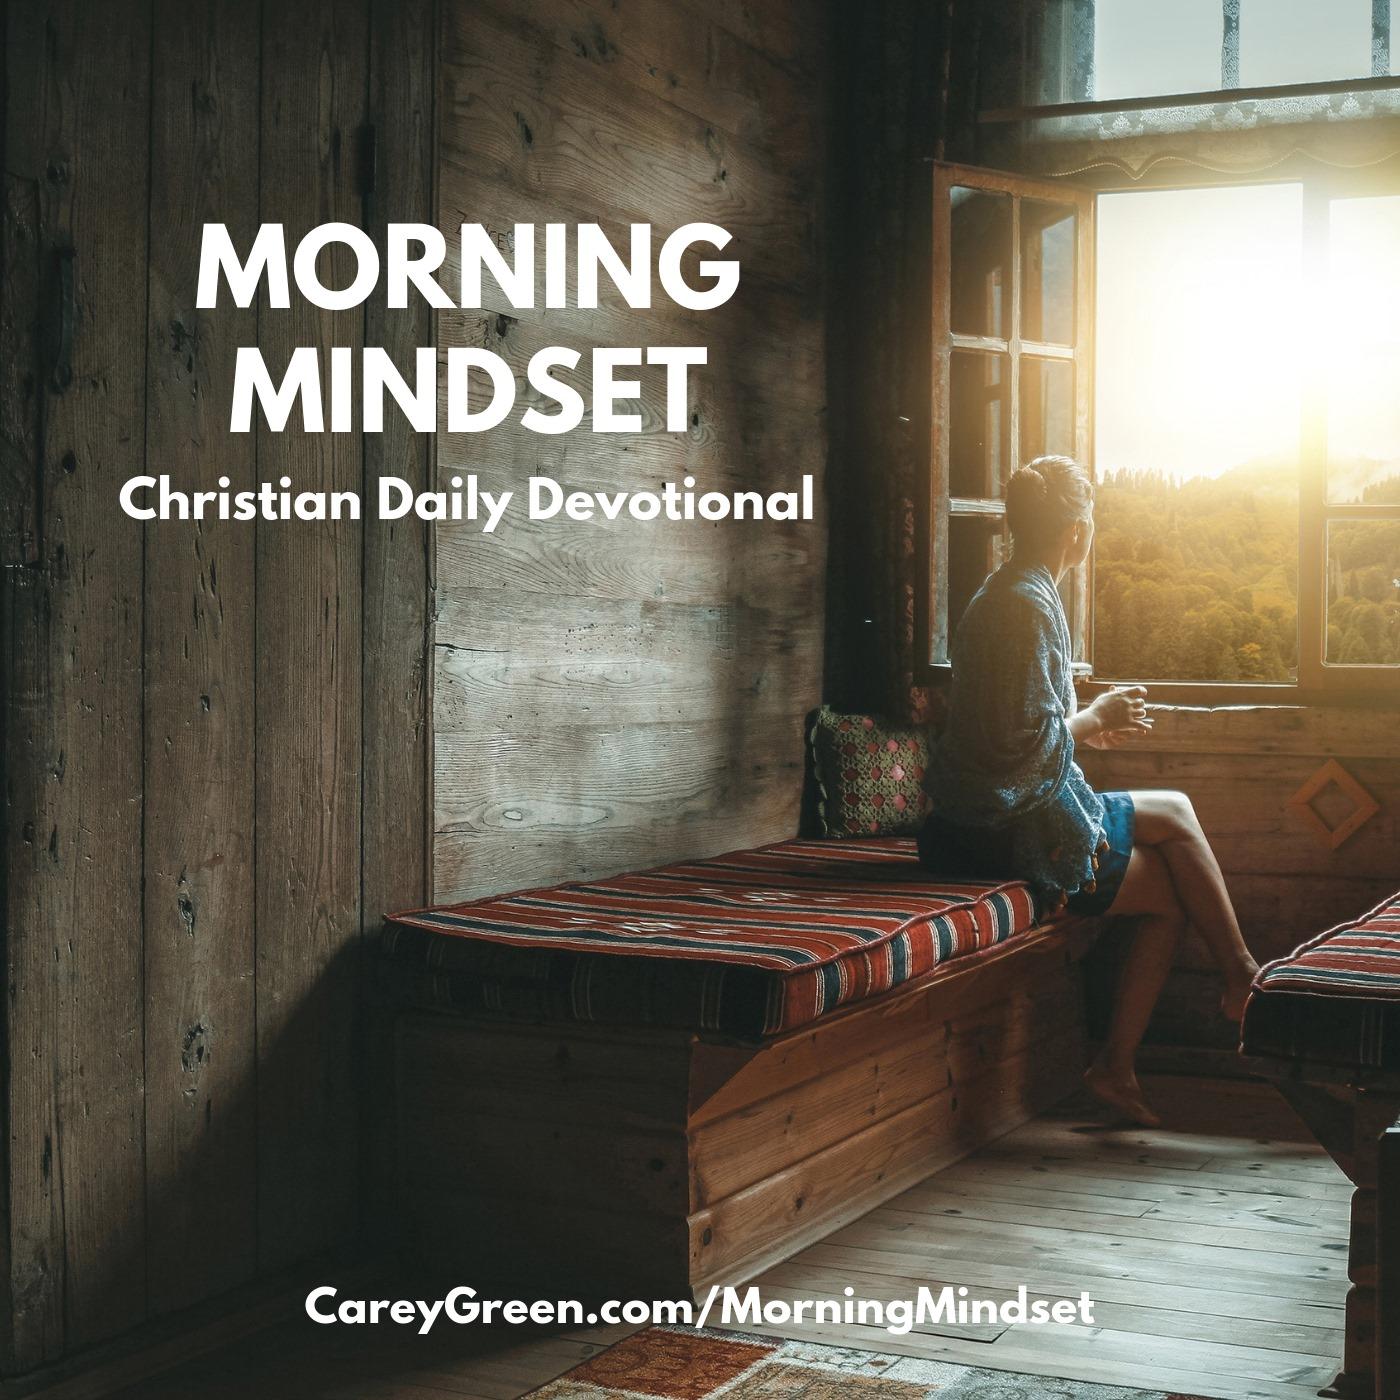 Morning Mindset Daily Christian Devotional show art